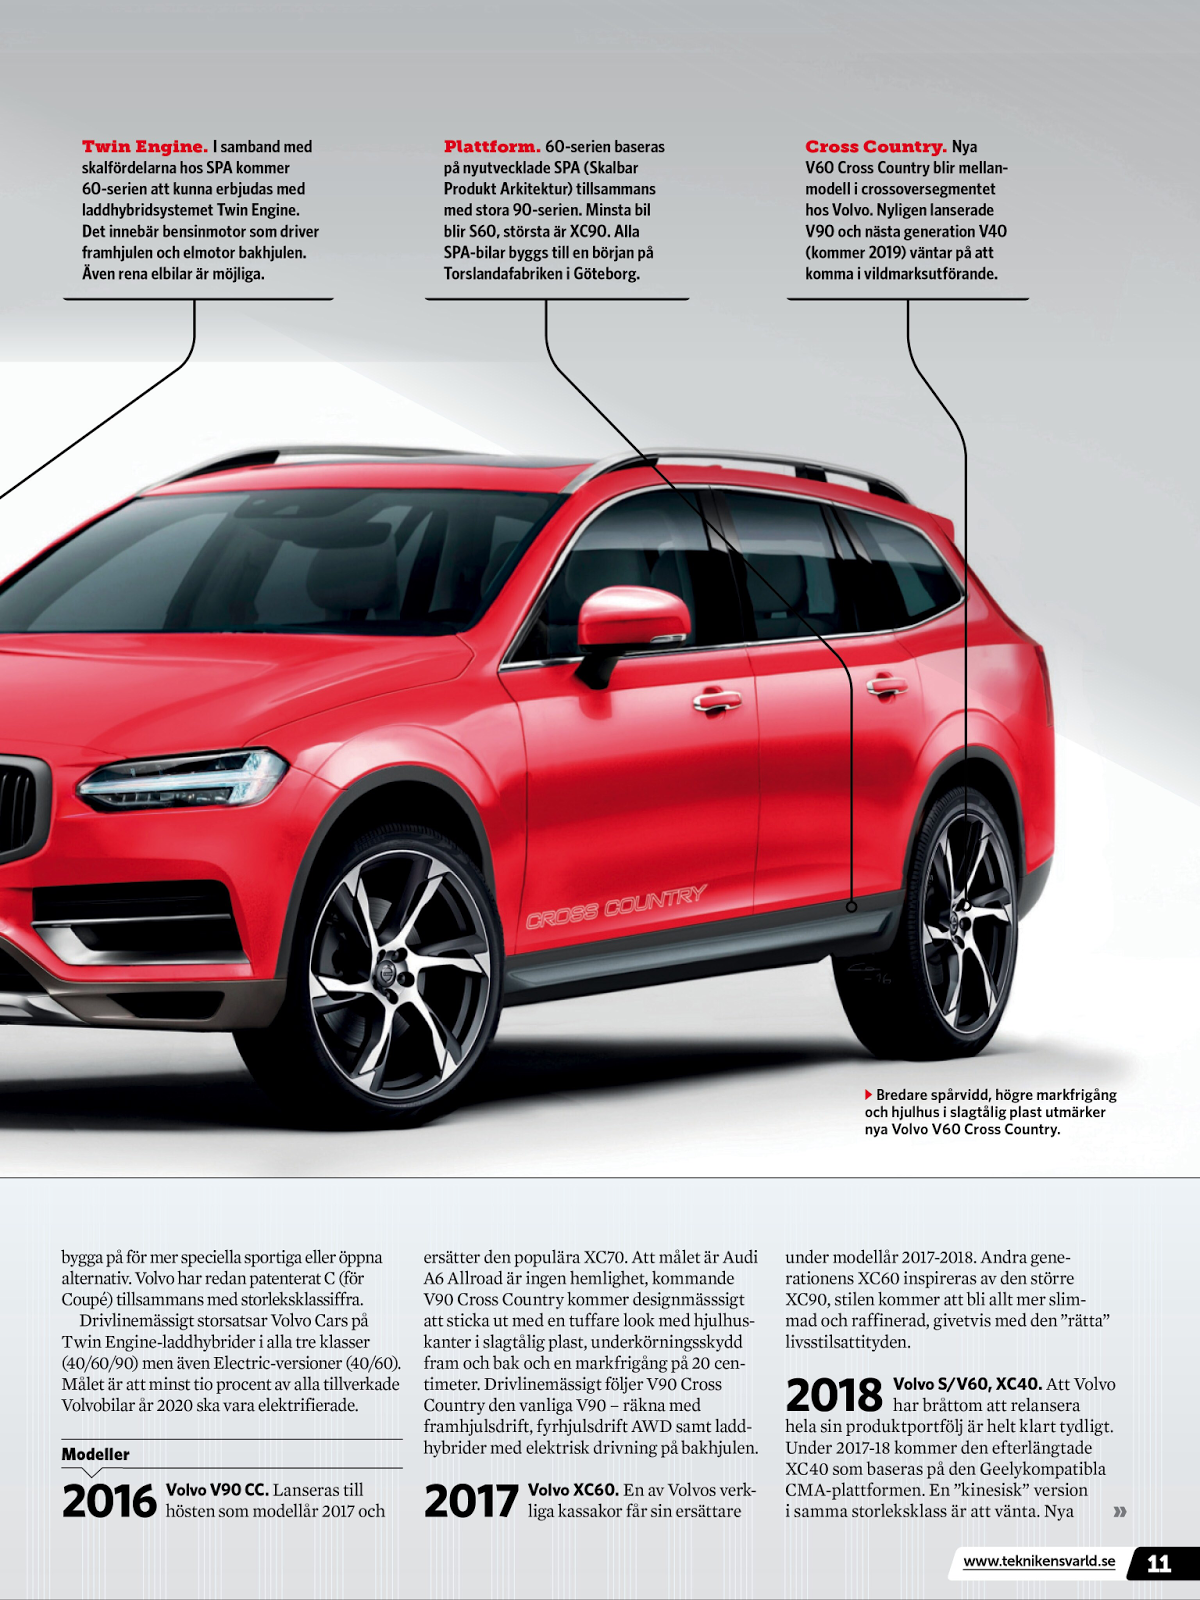 My World Of Volvo Volvo Model Lineup By 2020